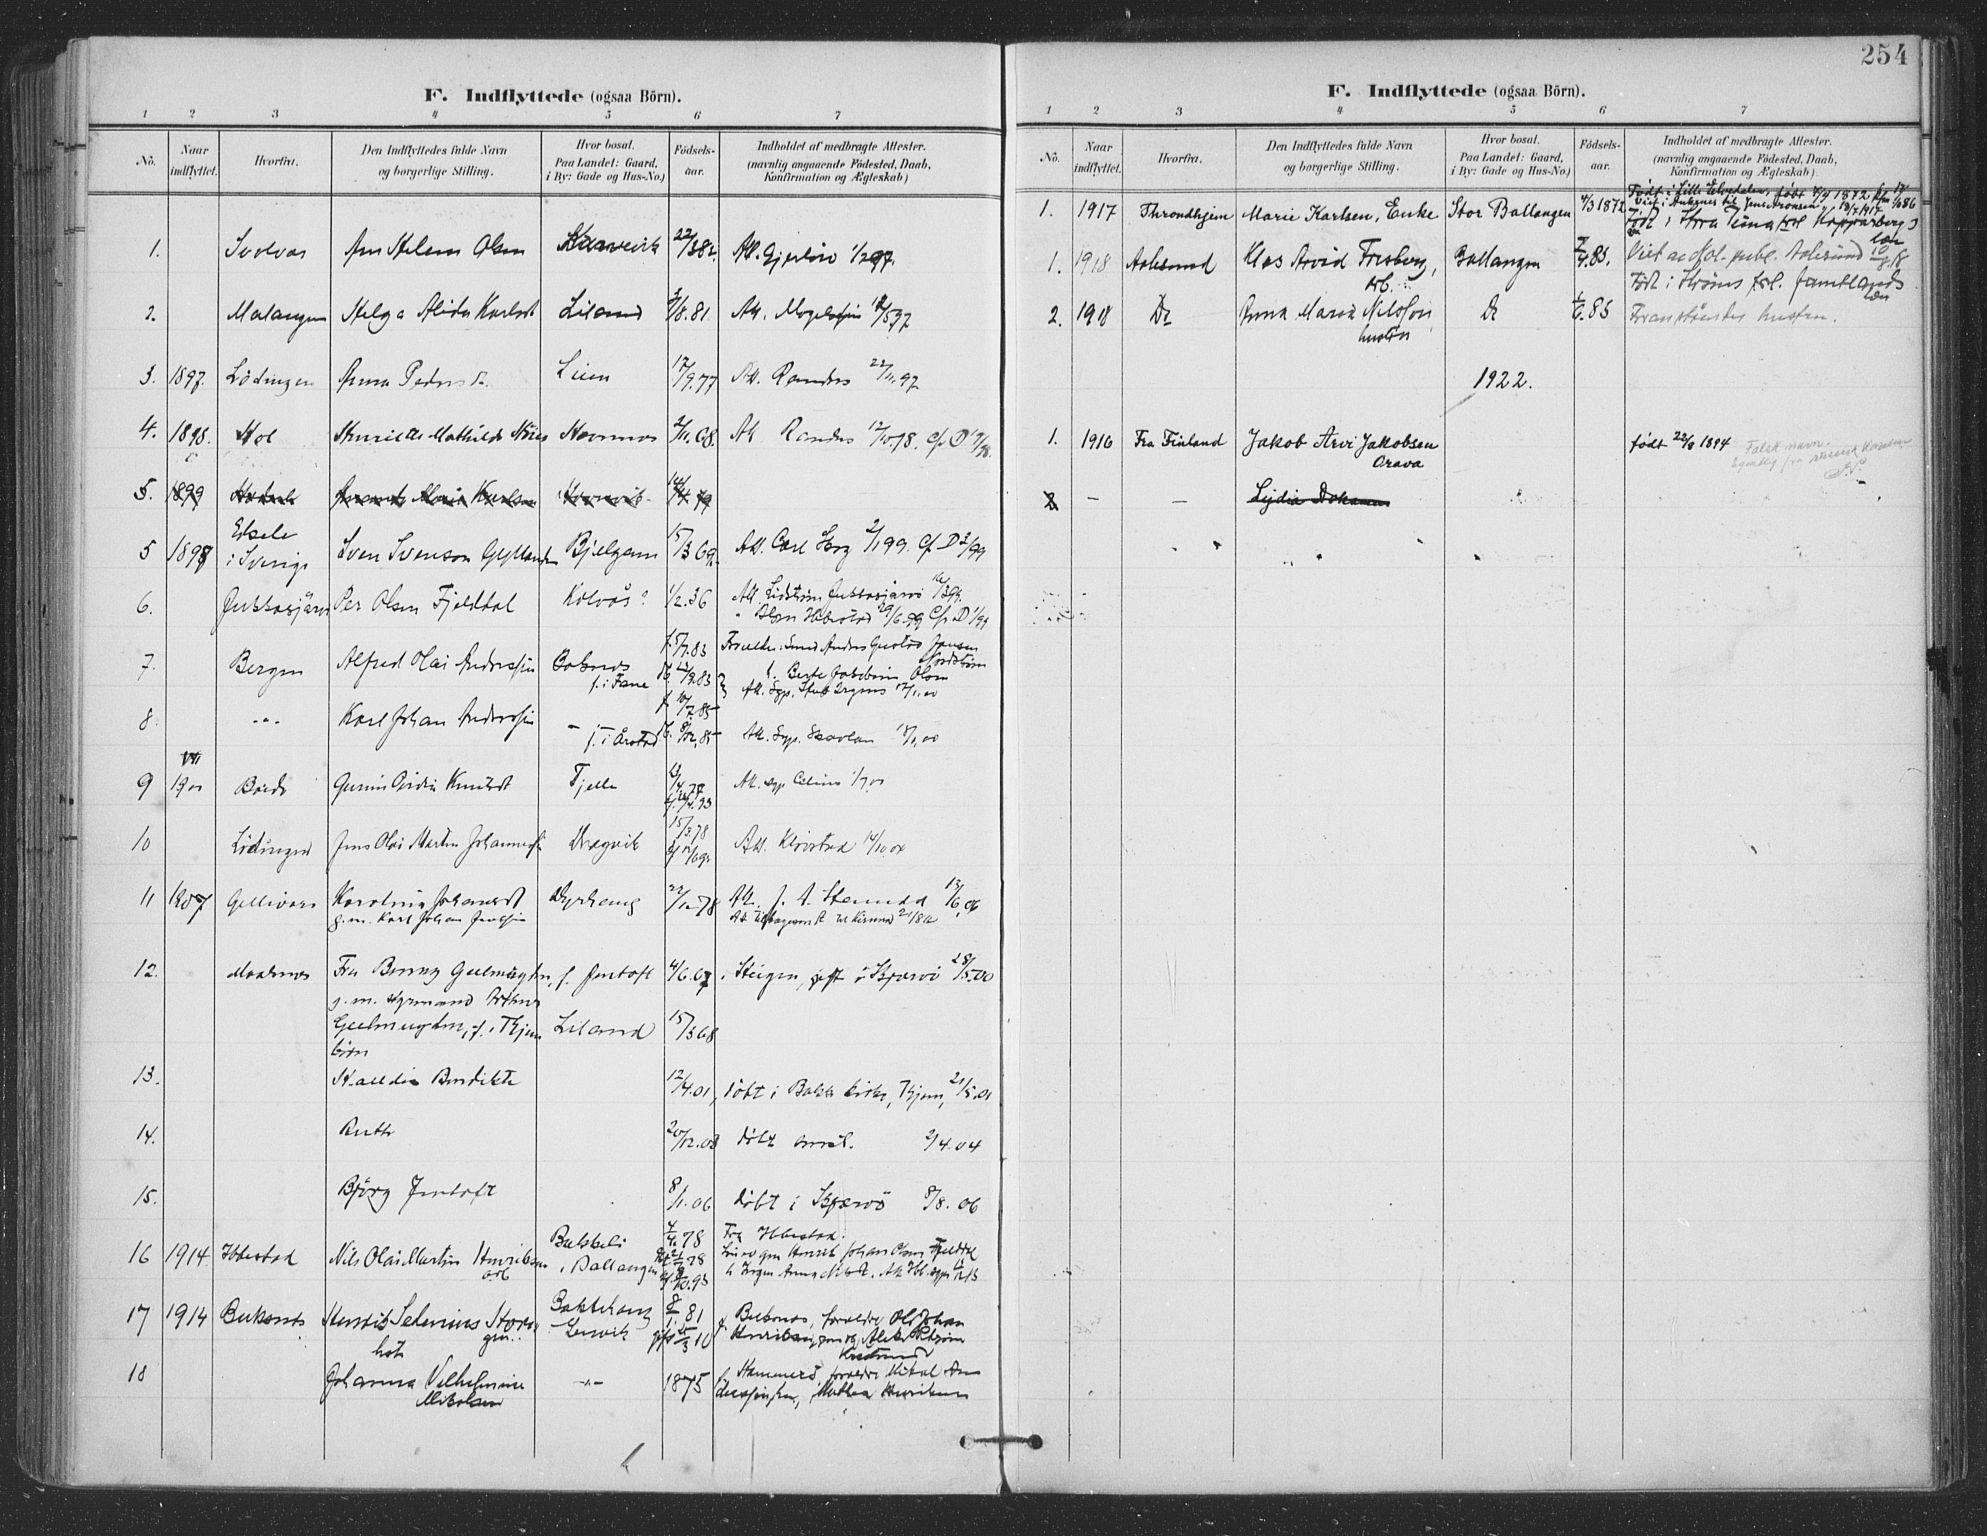 SAT, Ministerialprotokoller, klokkerbøker og fødselsregistre - Nordland, 863/L0899: Ministerialbok nr. 863A11, 1897-1906, s. 254